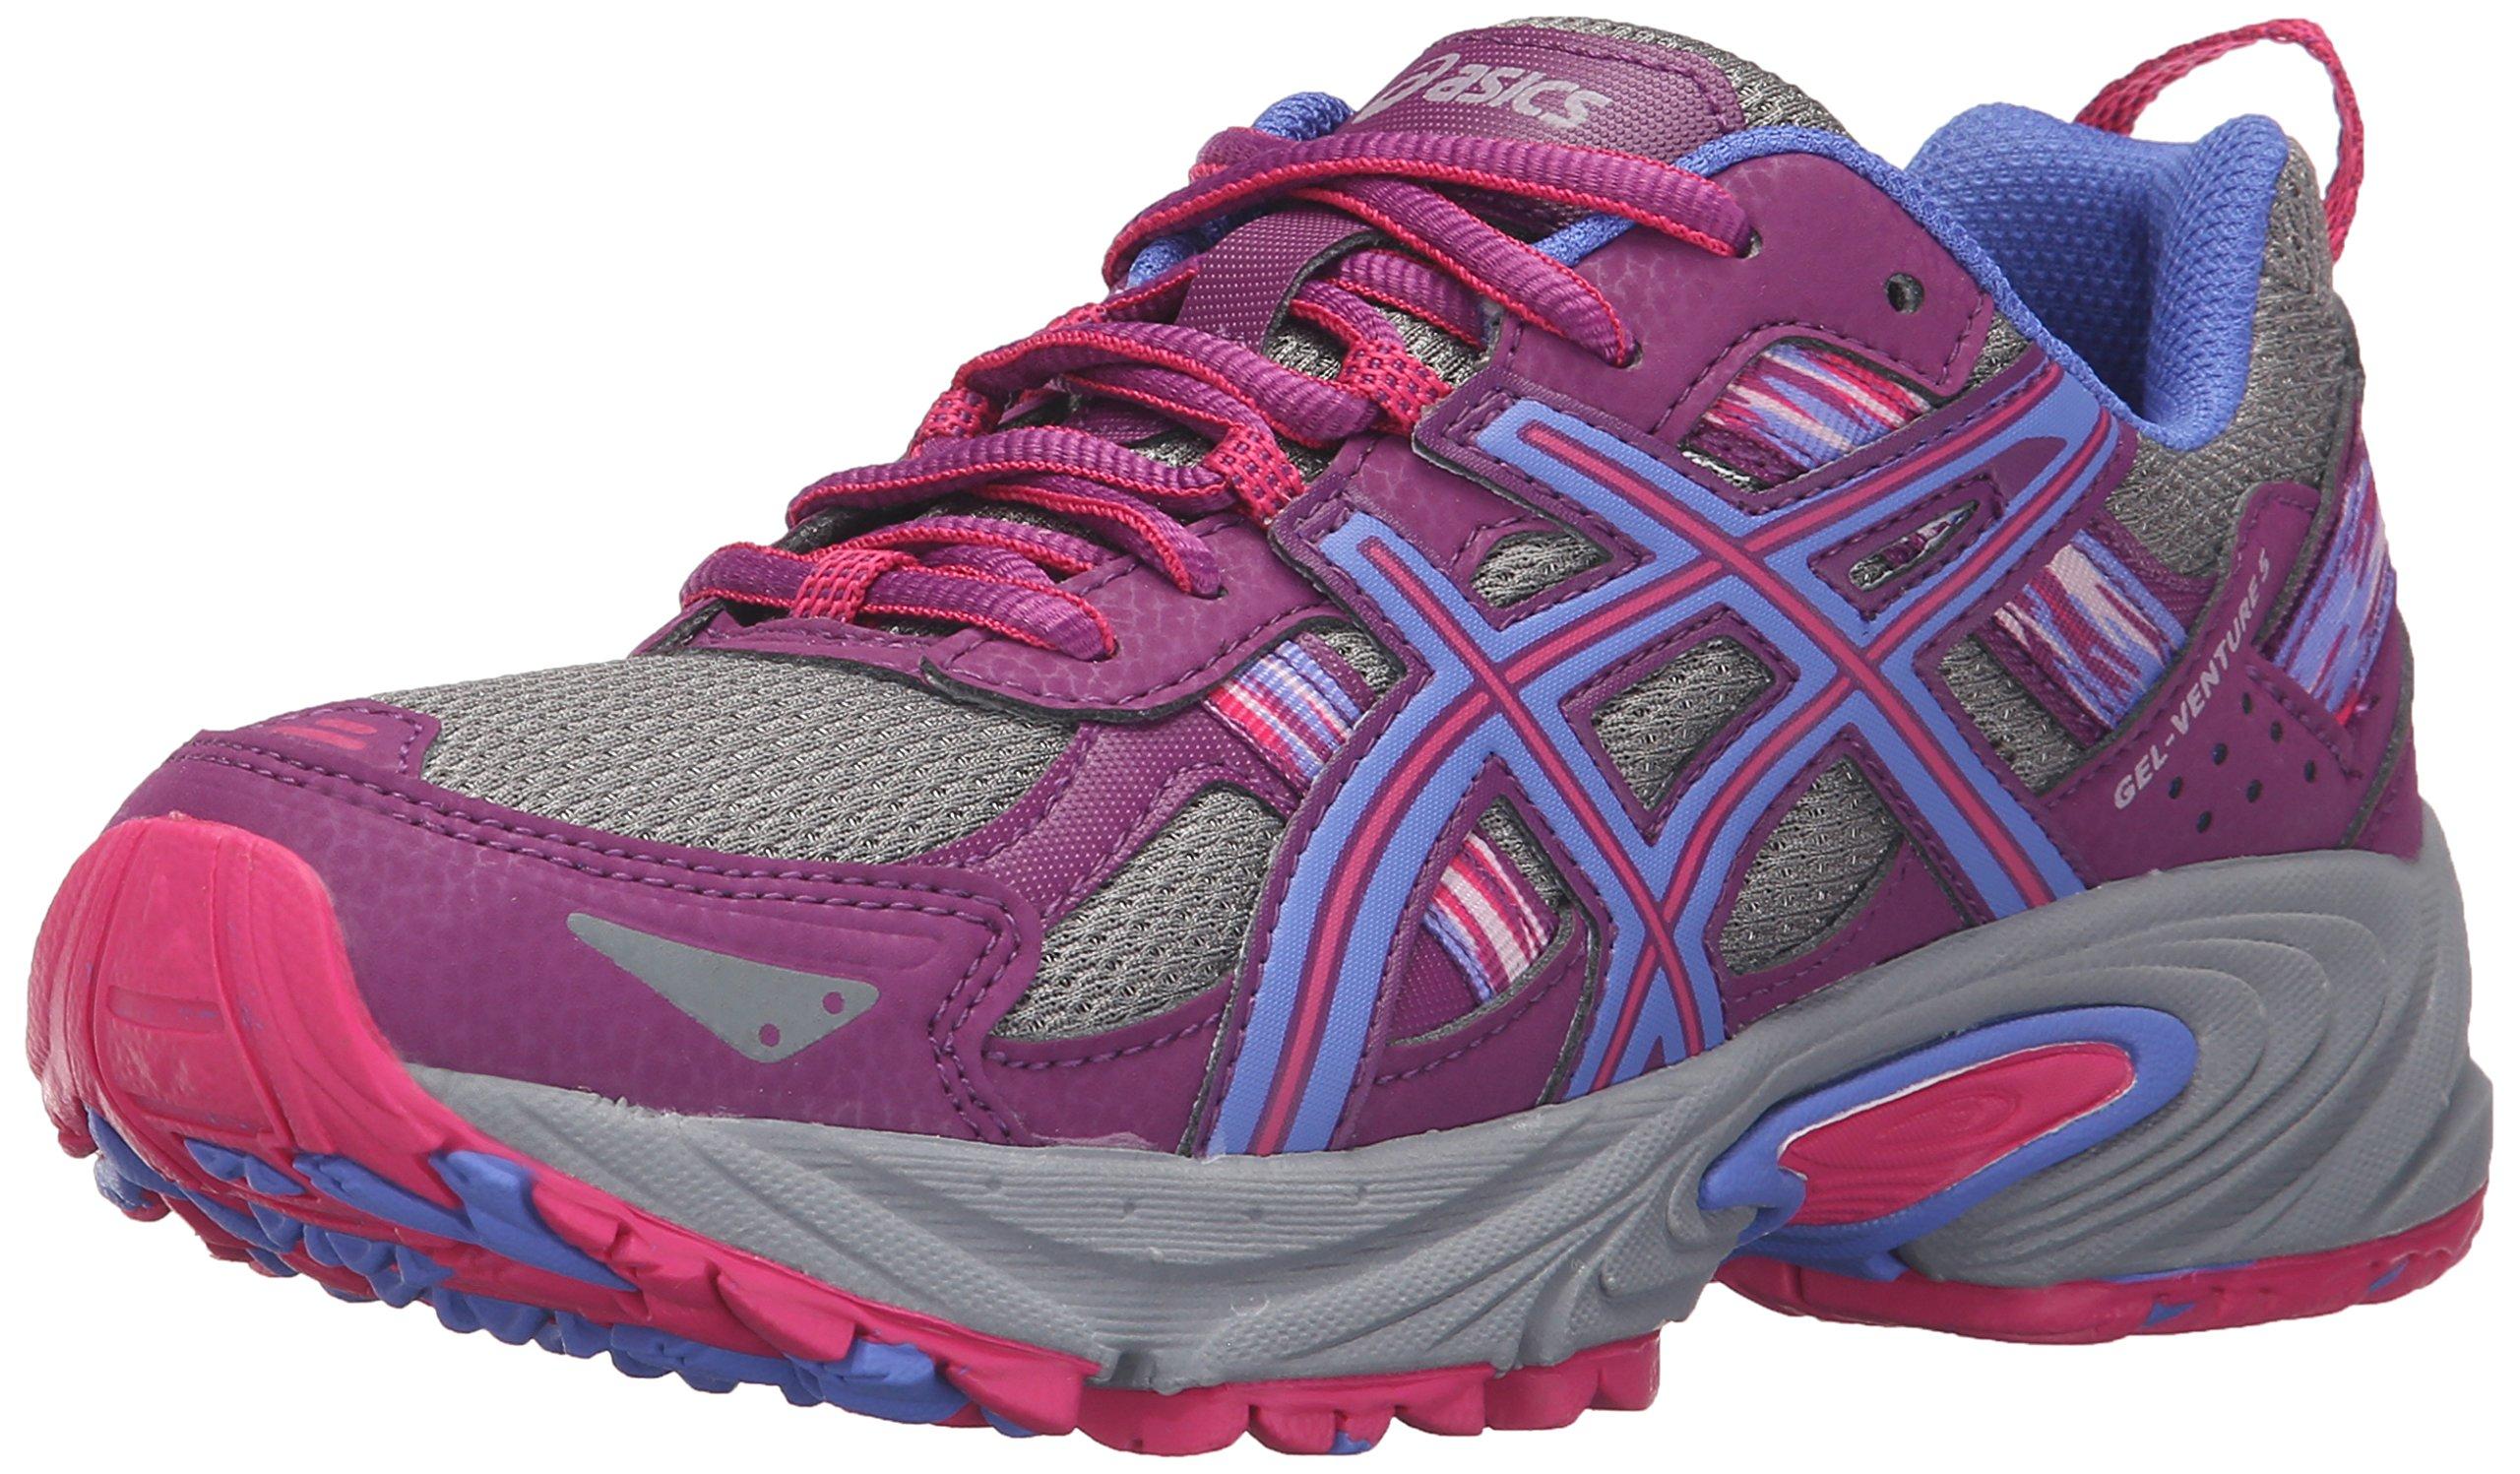 ASICS Women's Gel-Venture 5 Trail Runner Phlox/Sport Pink/Aluminum 6 M US